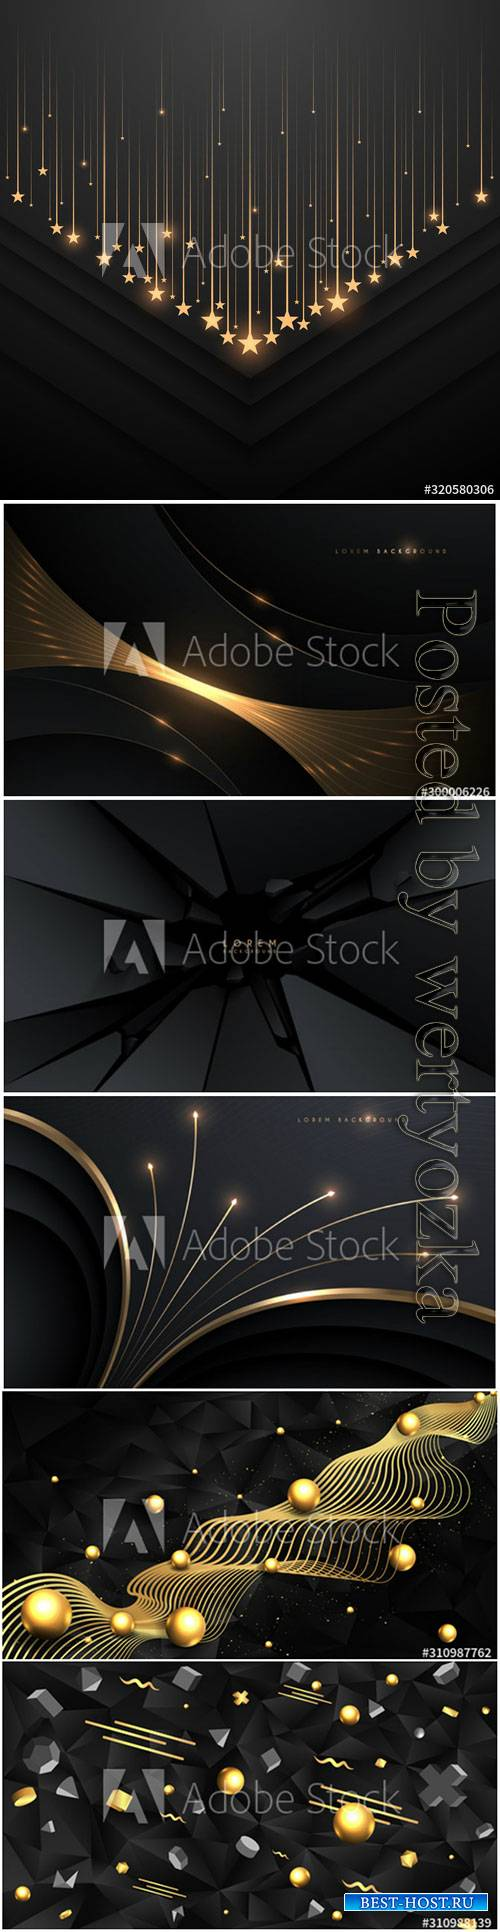 Golden black 3D primitives realistic geometric vector illustration